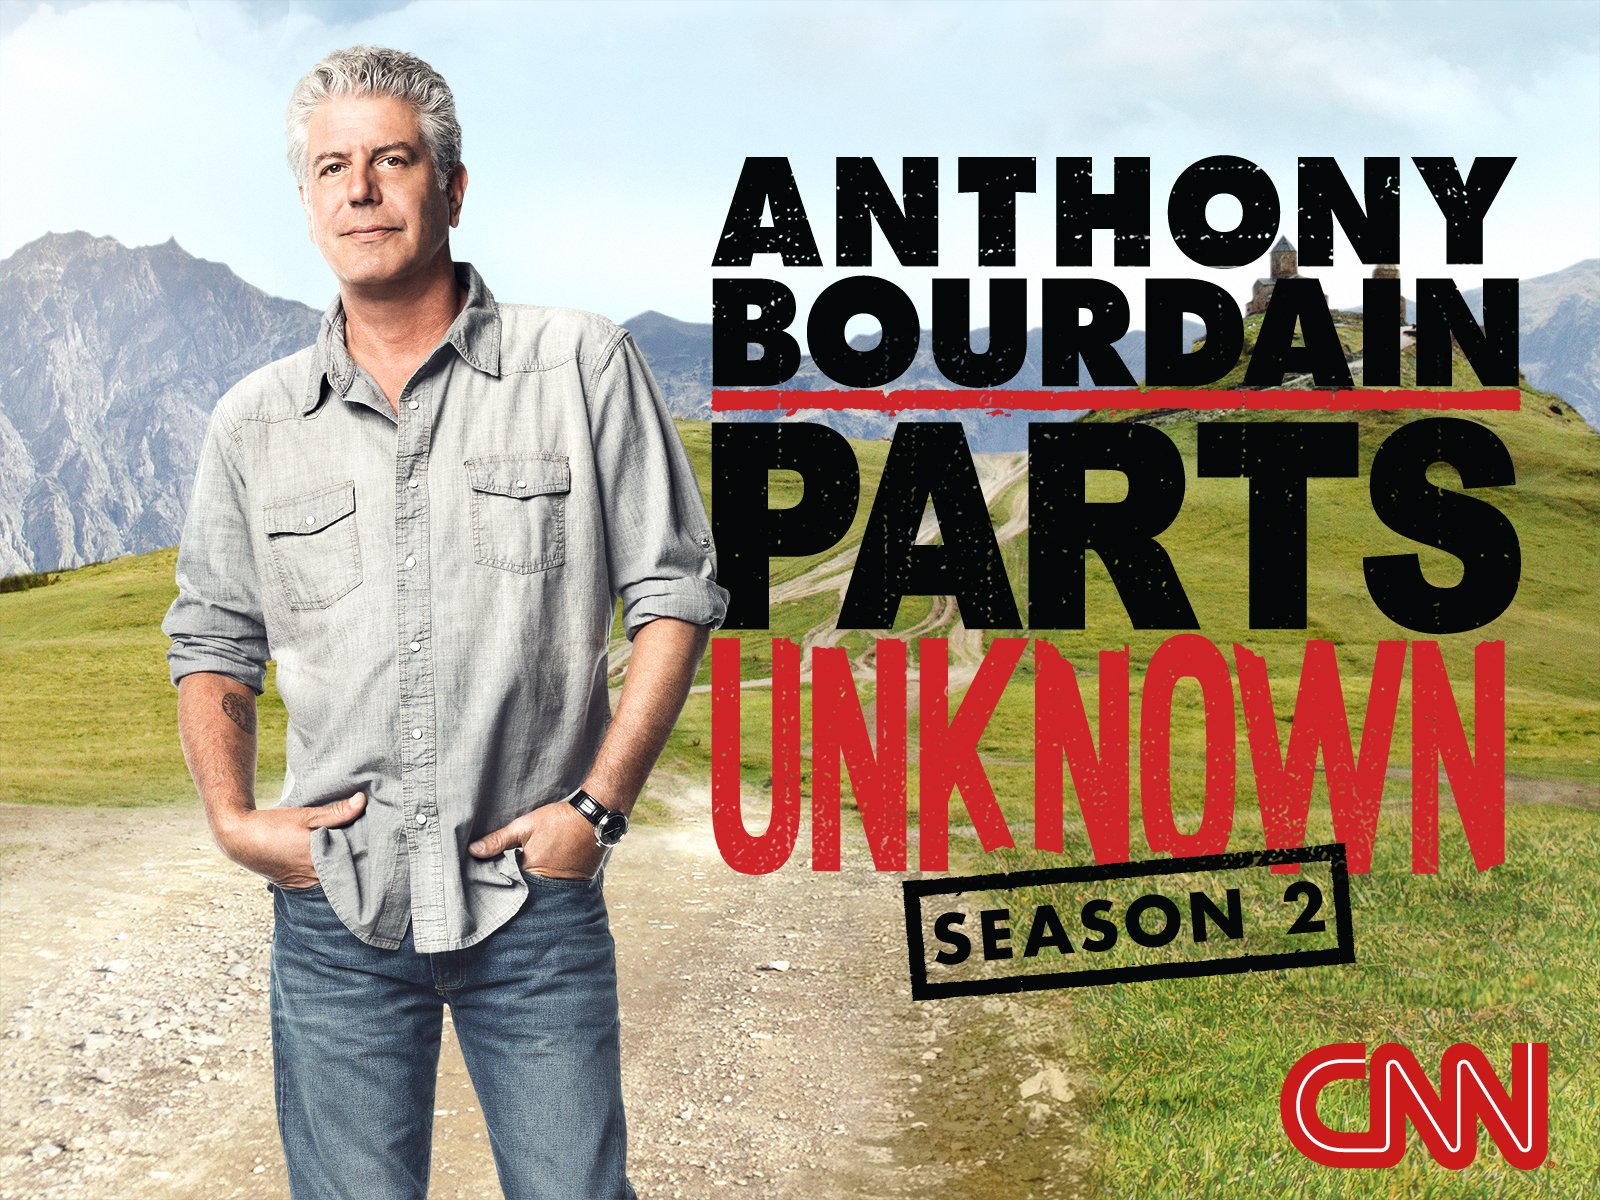 f139ff3291fd Amazon.com: Watch Anthony Bourdain: Parts Unknown Season 2 | Prime Video